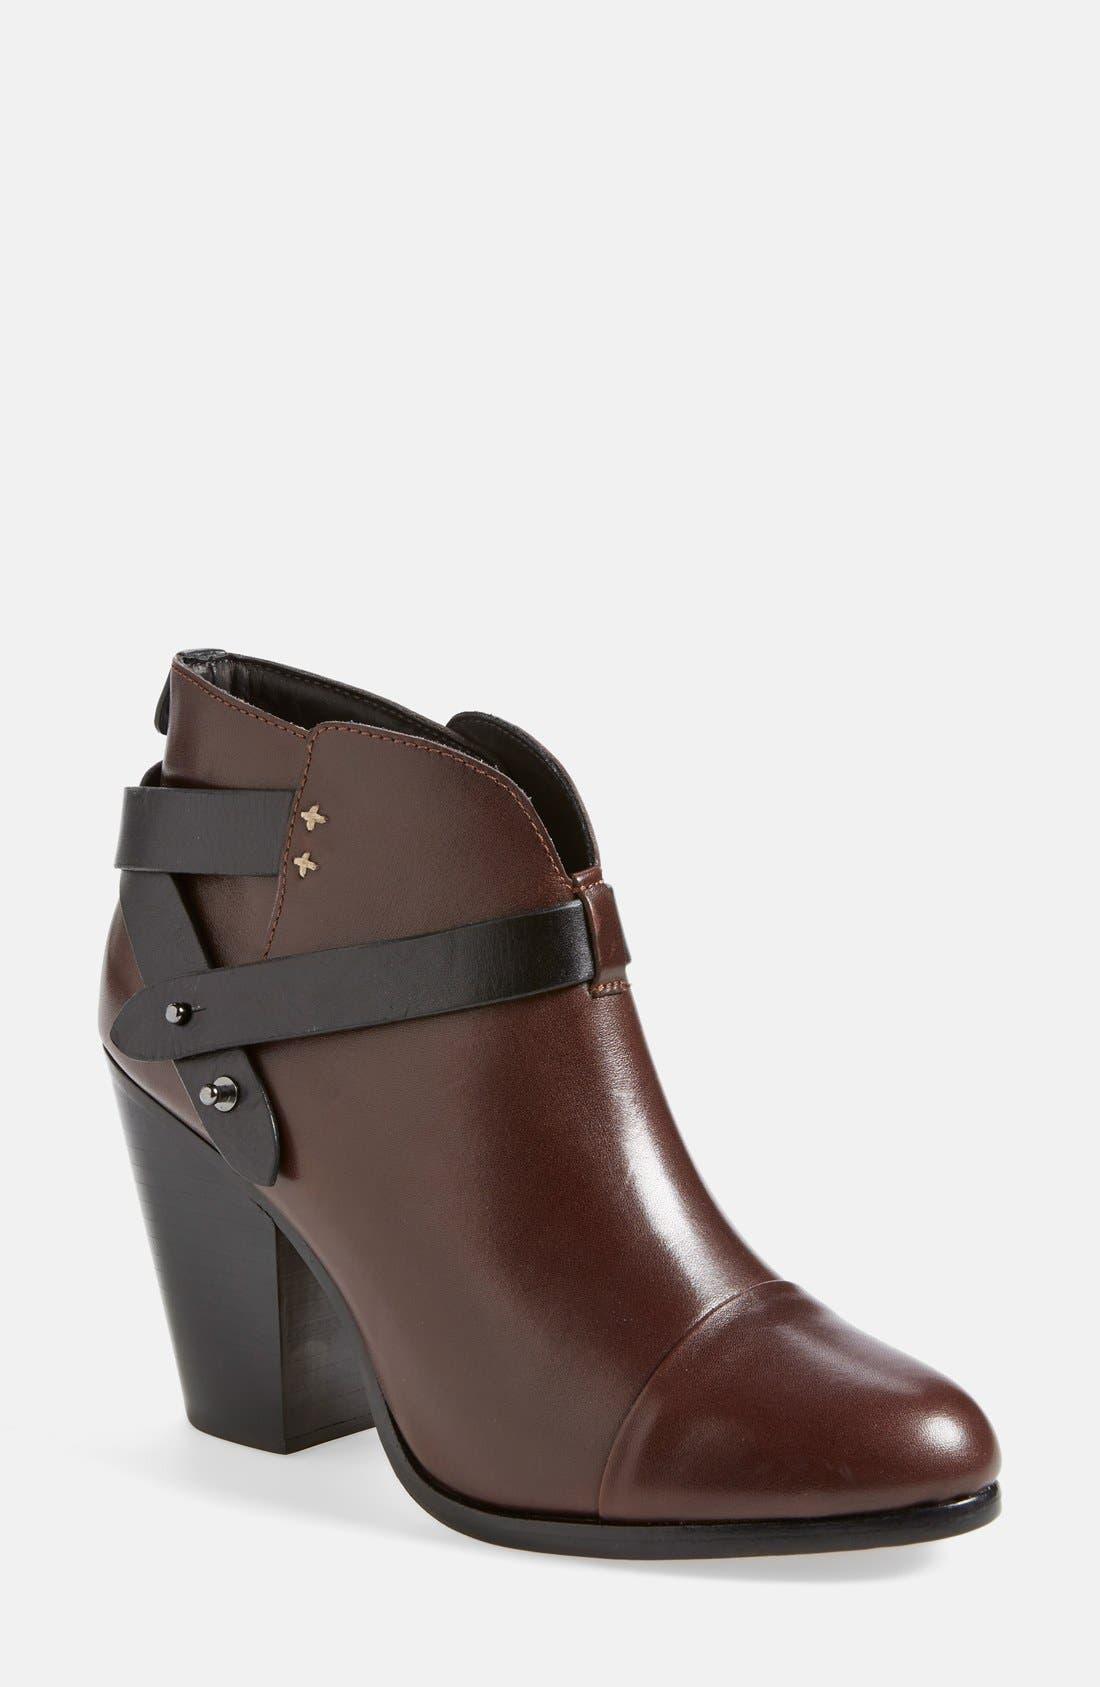 Alternate Image 1 Selected - rag & bone 'Harrow' Leather Boot (Women) (Nordstrom Exclusive)